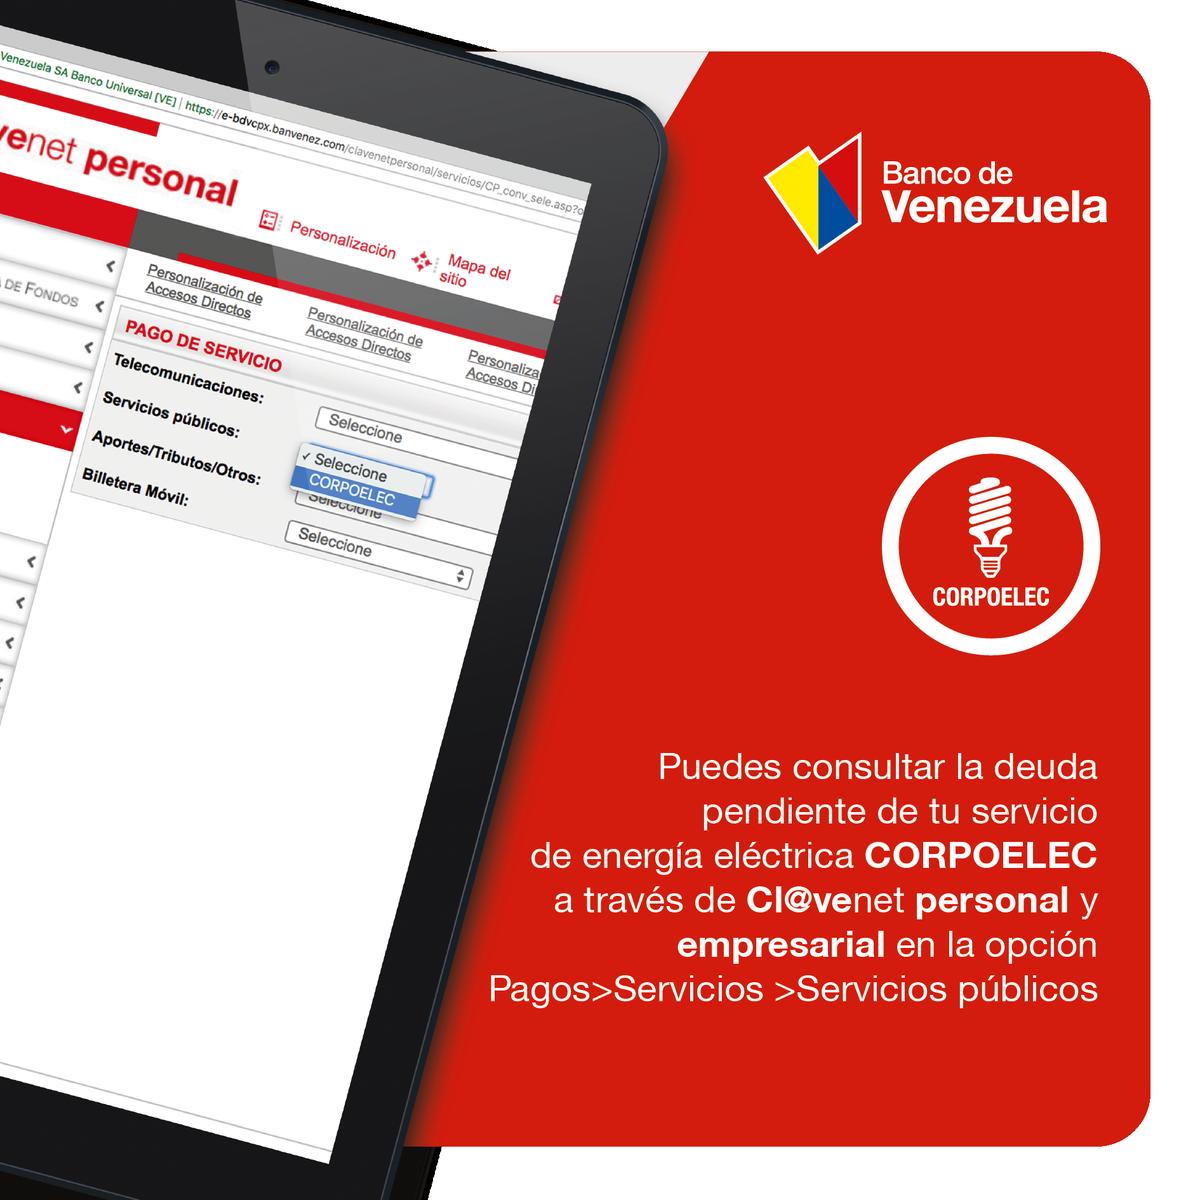 Banco de venezuela bcodevenezuela twitter for Banco de venezuela clavenet personal